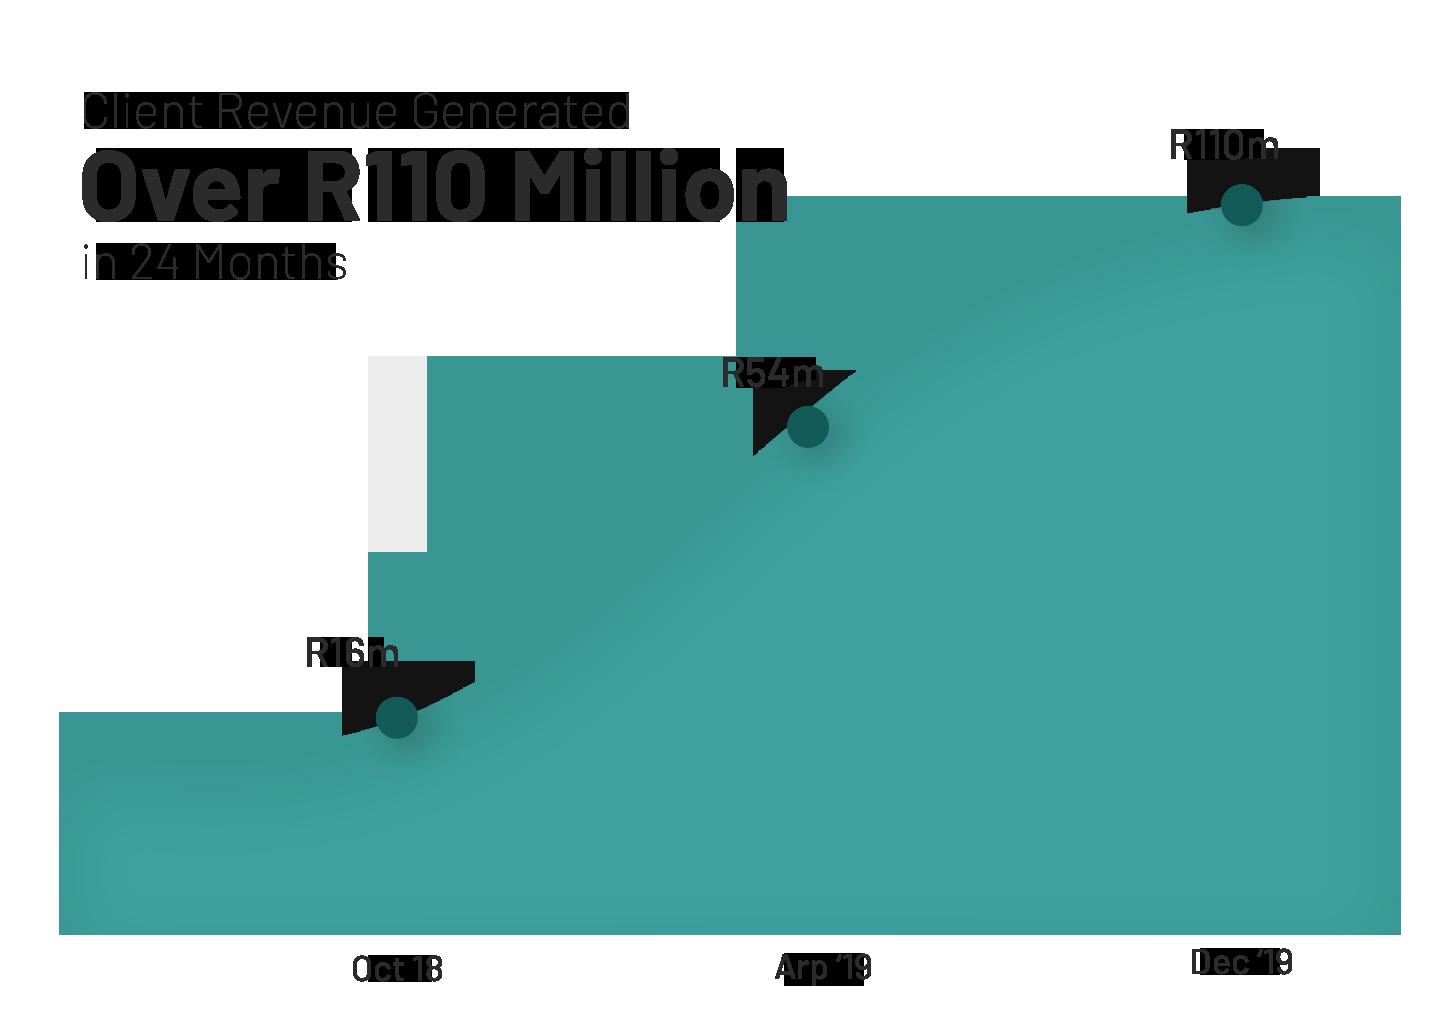 R100m_sales_generated